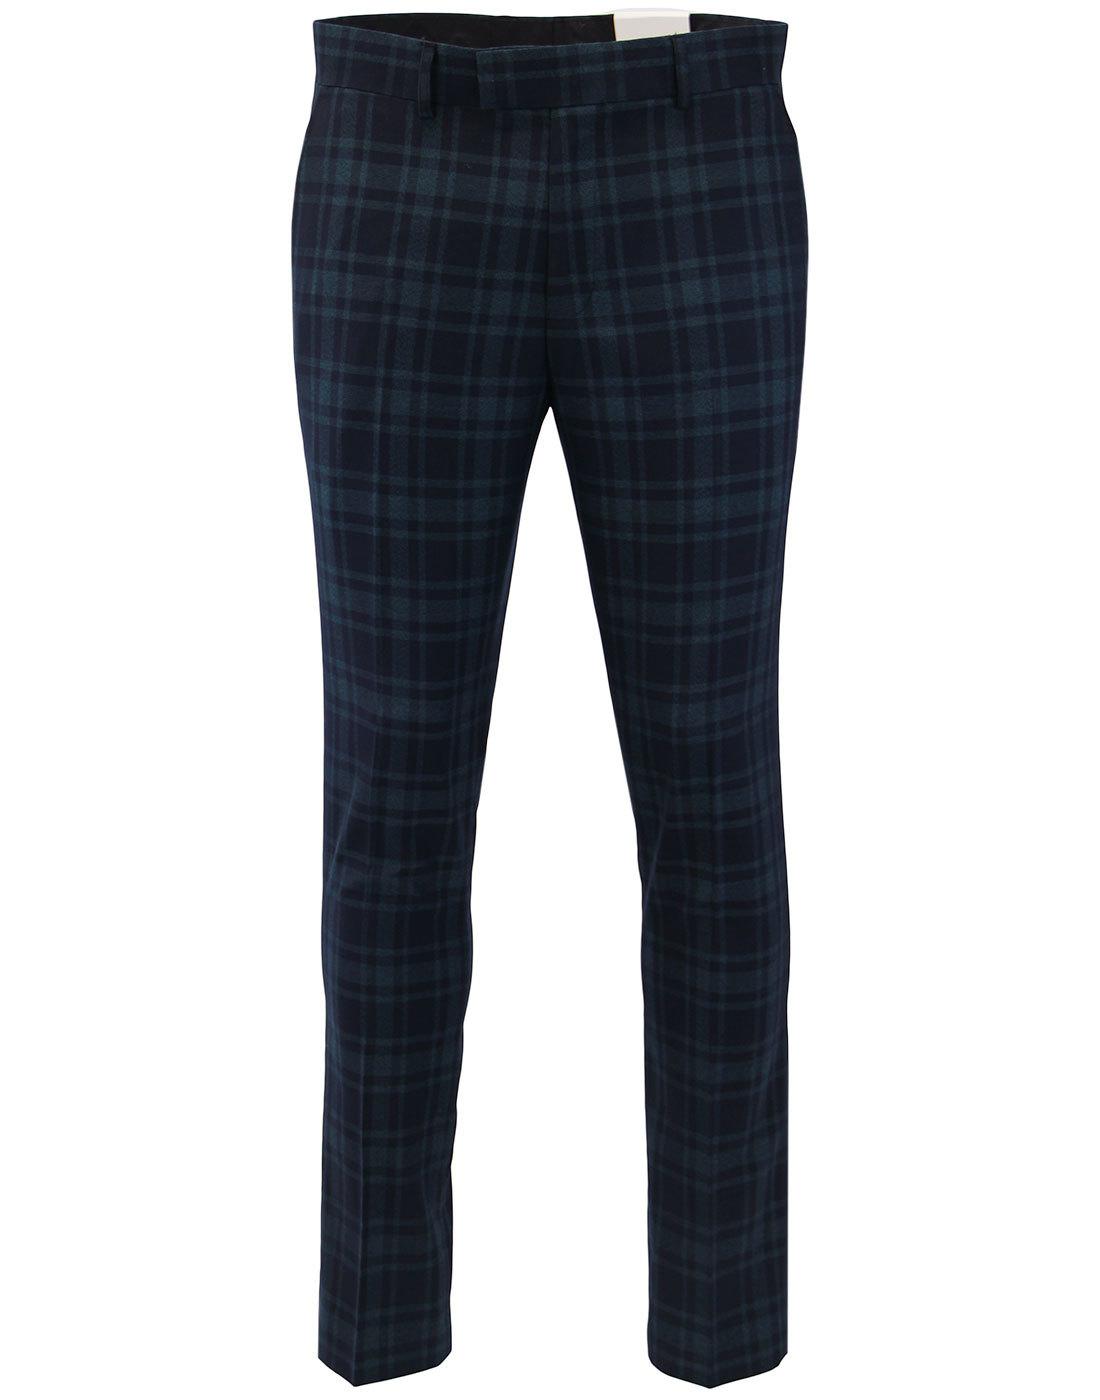 Ashworth FARAH Retro Mod Twill Check Slim Trousers